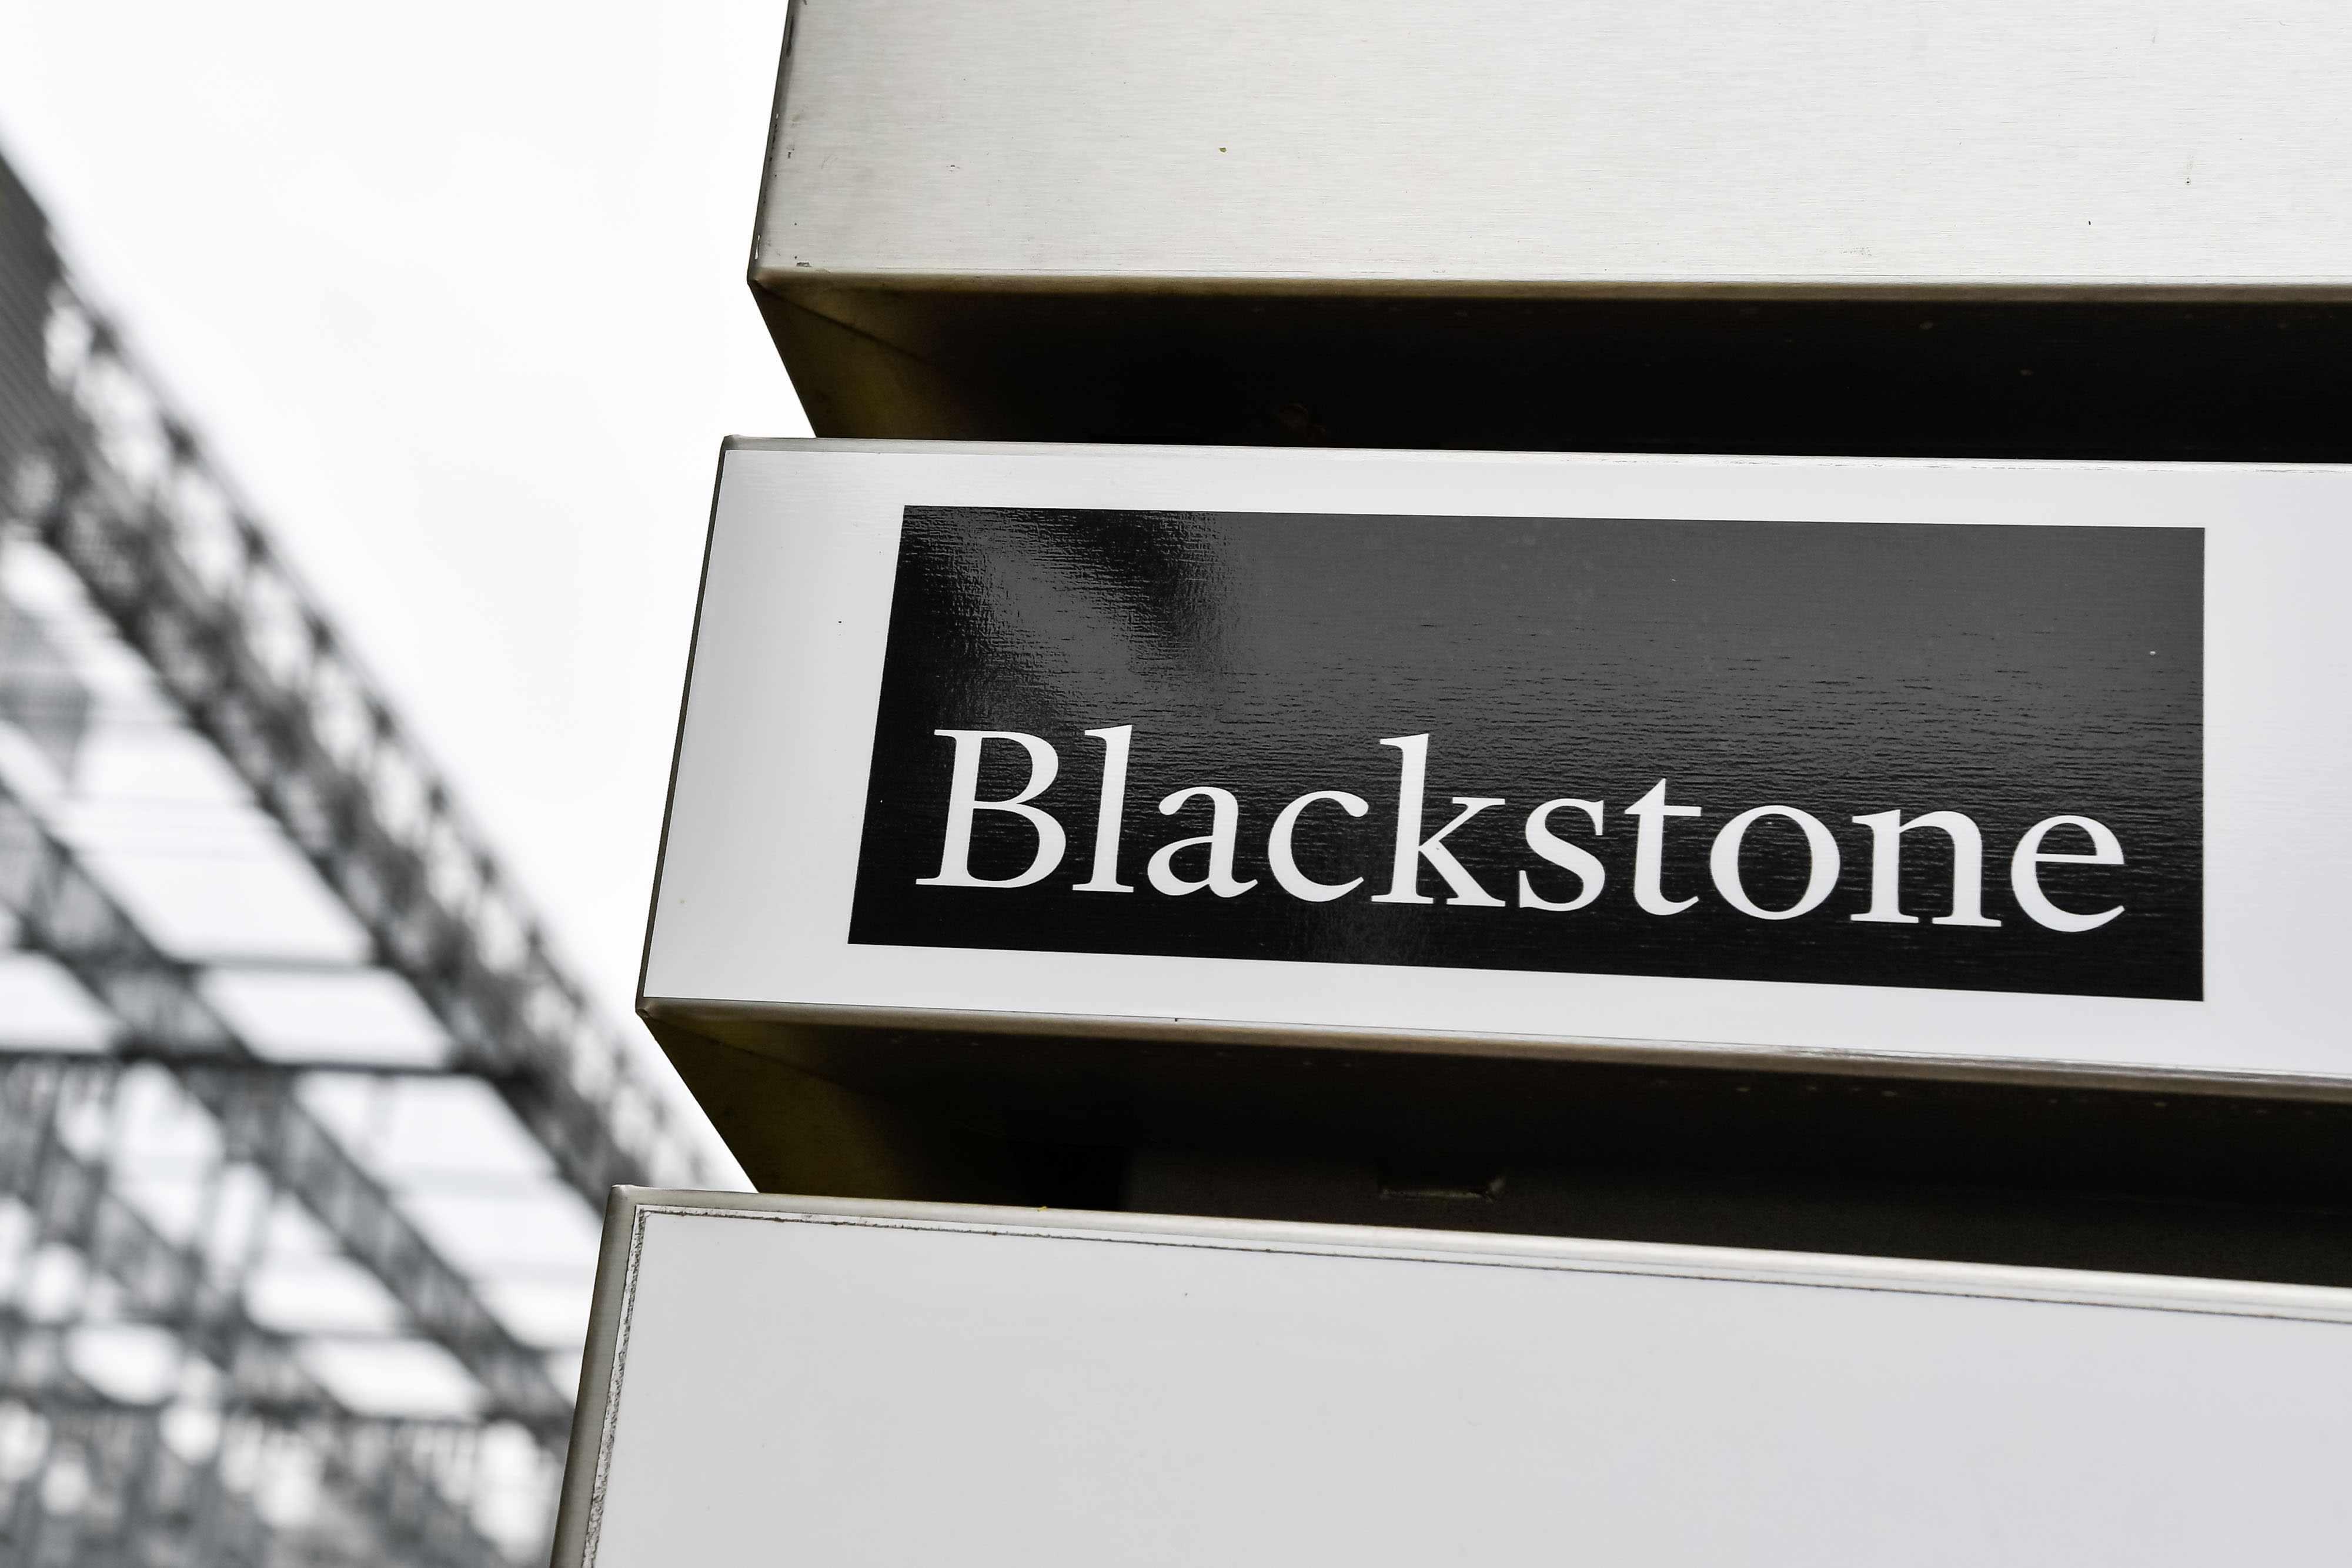 didi blackstone stocks shares airline